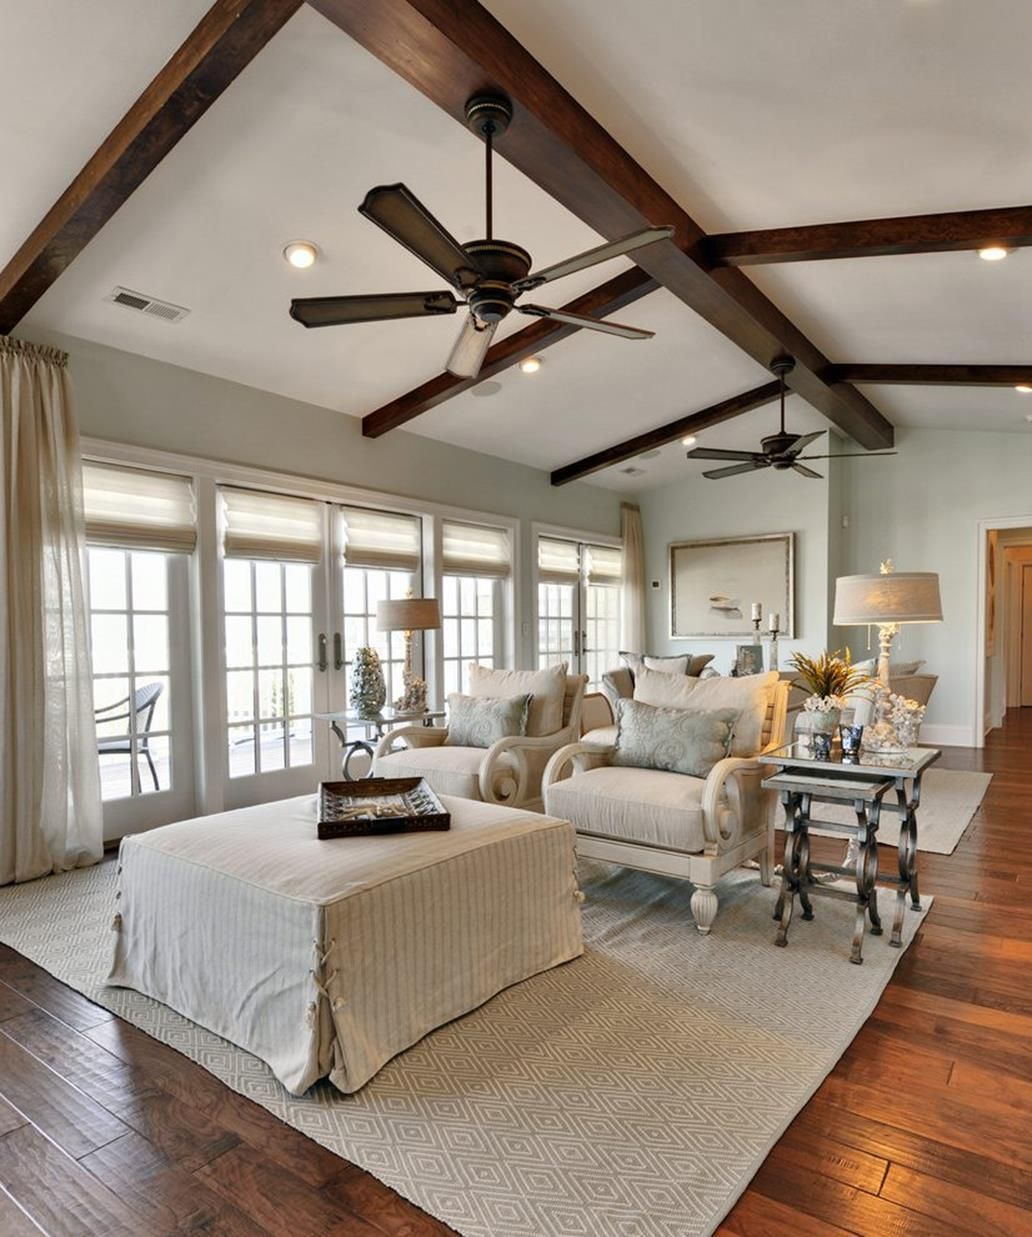 Stunning Slanted Ceiling Living Room Ideas 42 Decorecent Vaulted Ceiling Decor Quality Living Room Furniture Vaulted Ceiling Living Room